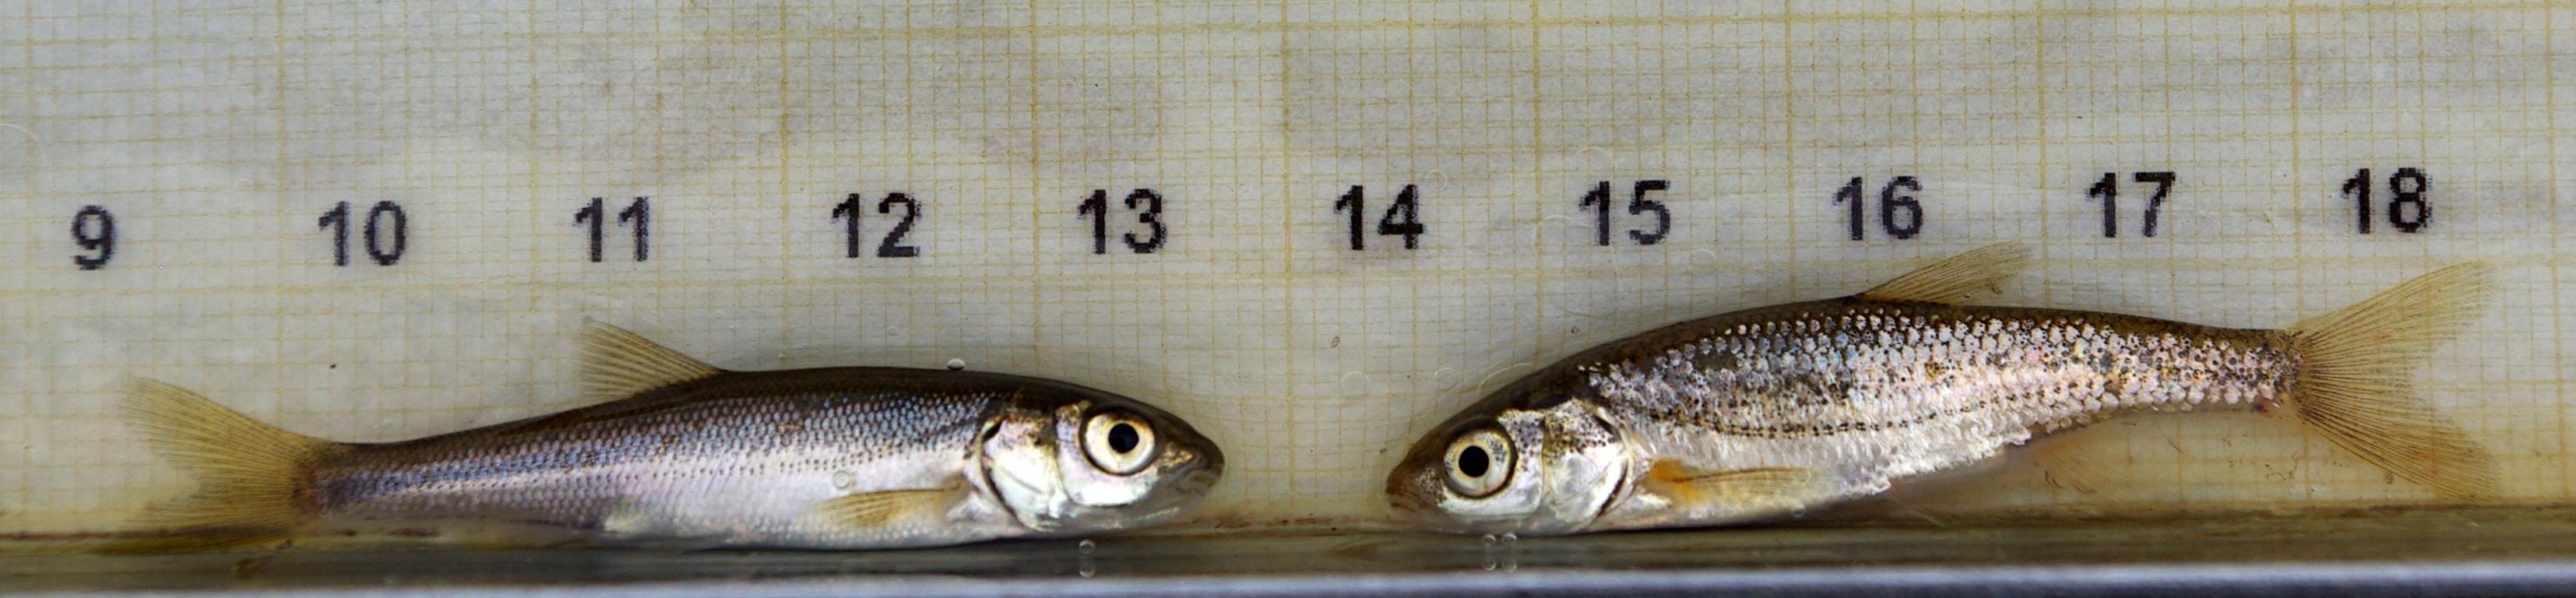 File:Cyprinidae 03 by-dpc.jpg - Wikimedia Commons